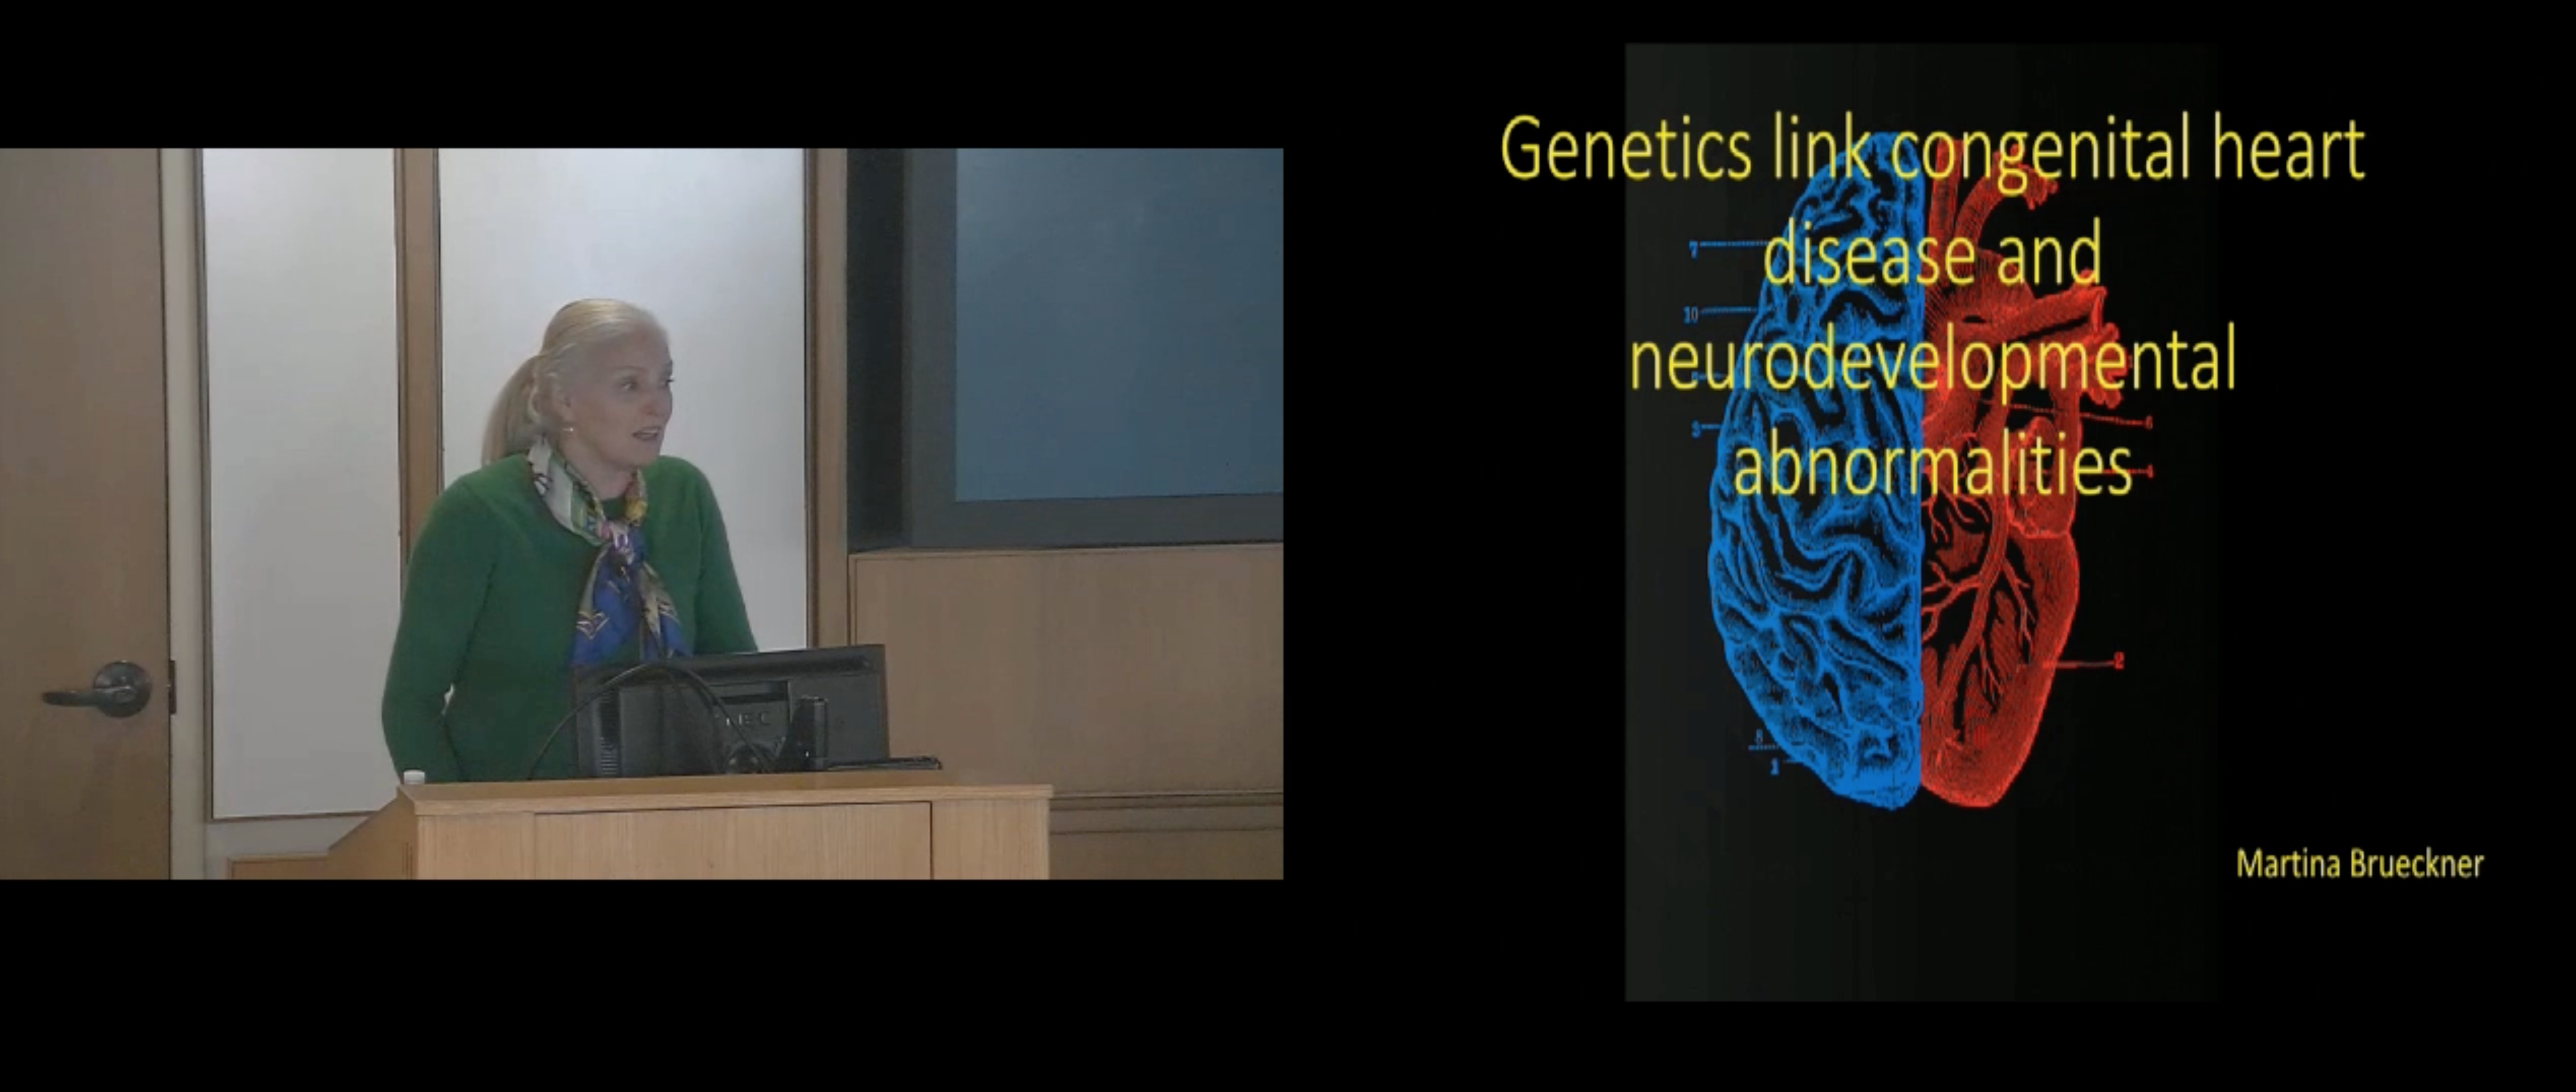 Genetics link congenital heart disease and neurodevelopment abnormalities